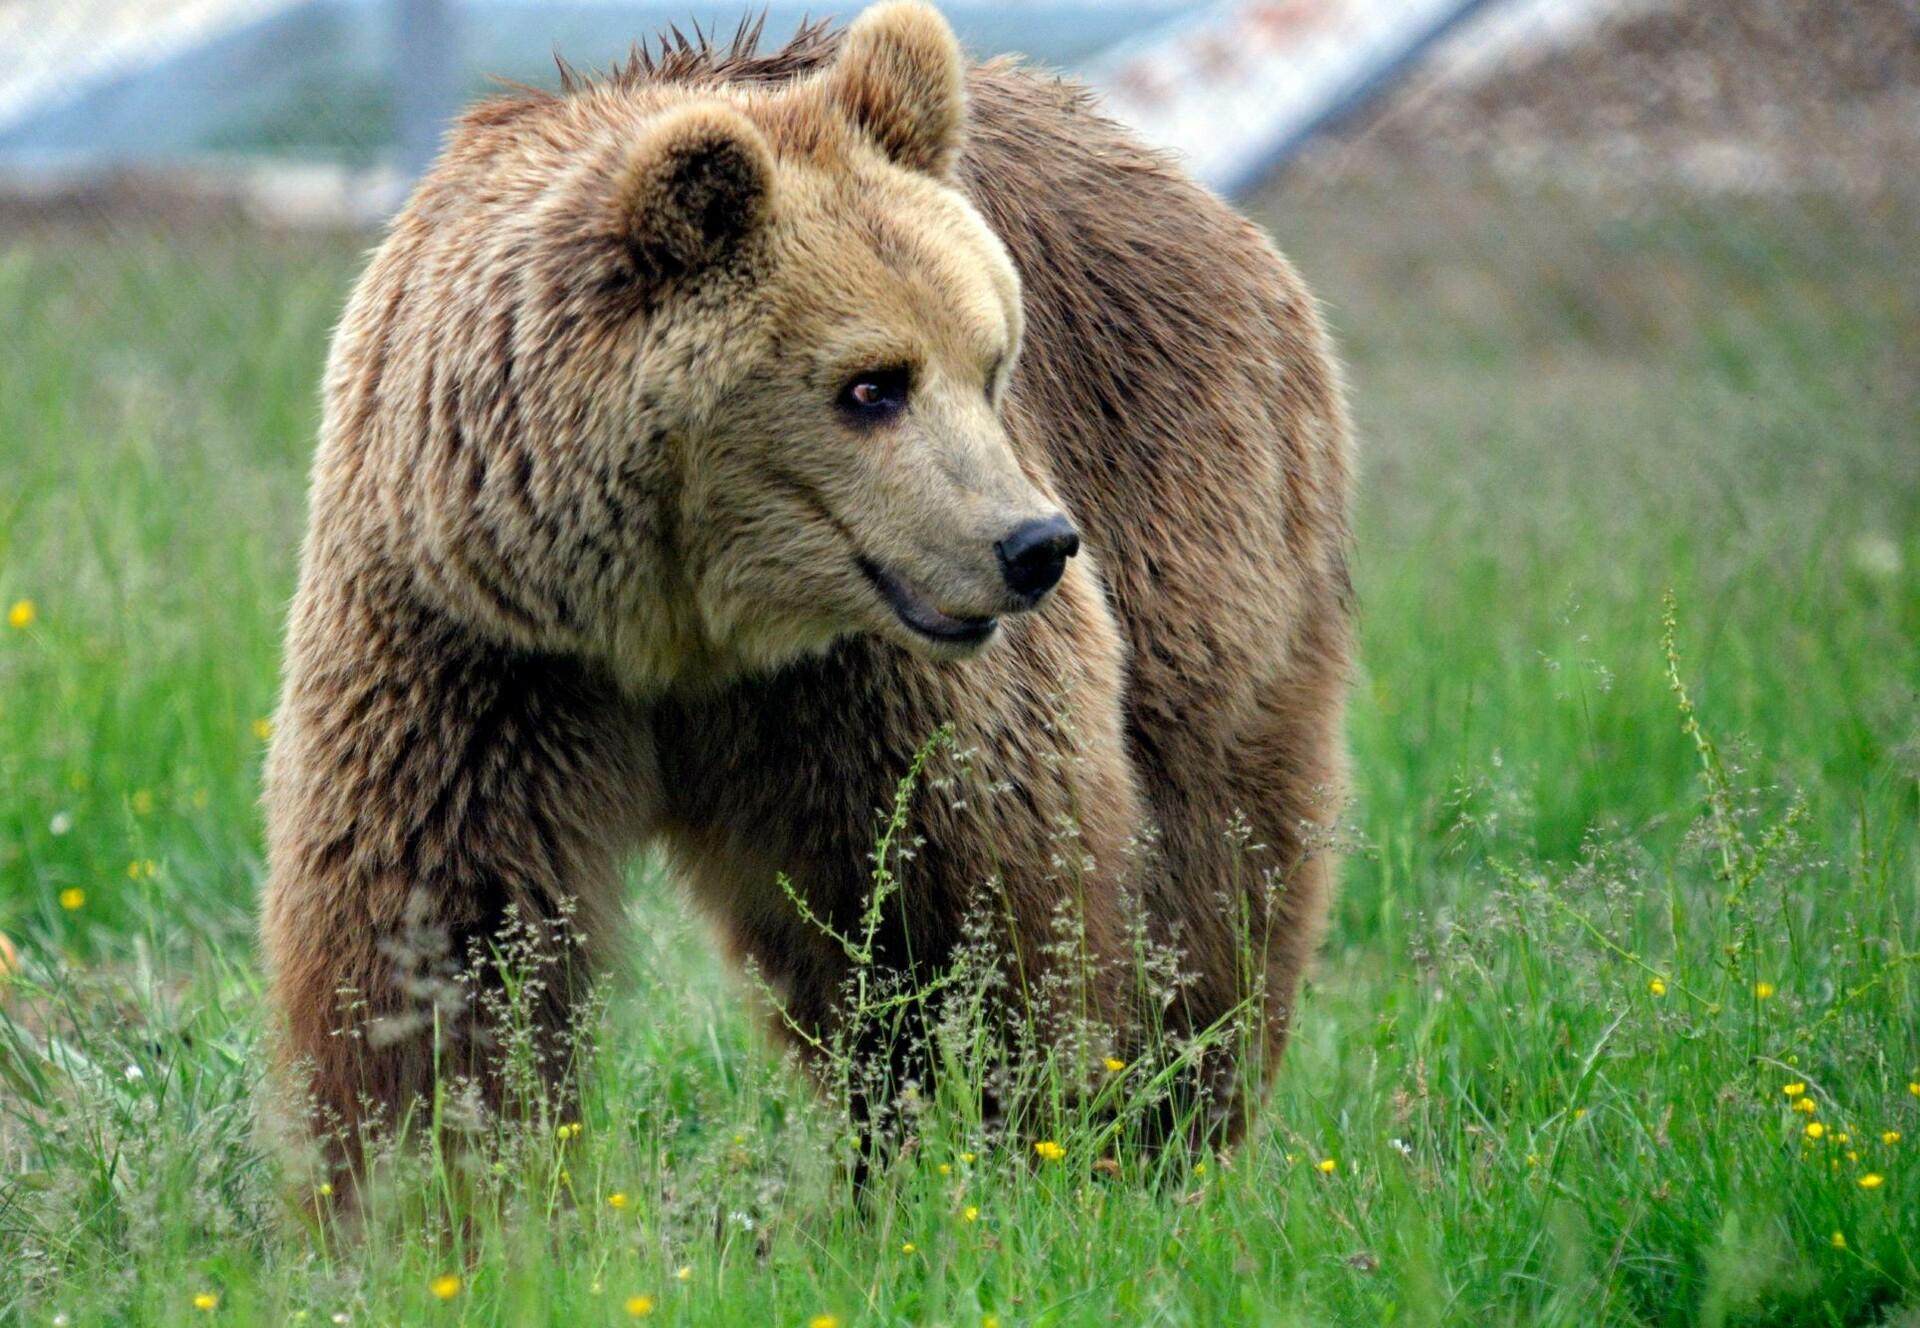 Brown Bear Rina in the grass